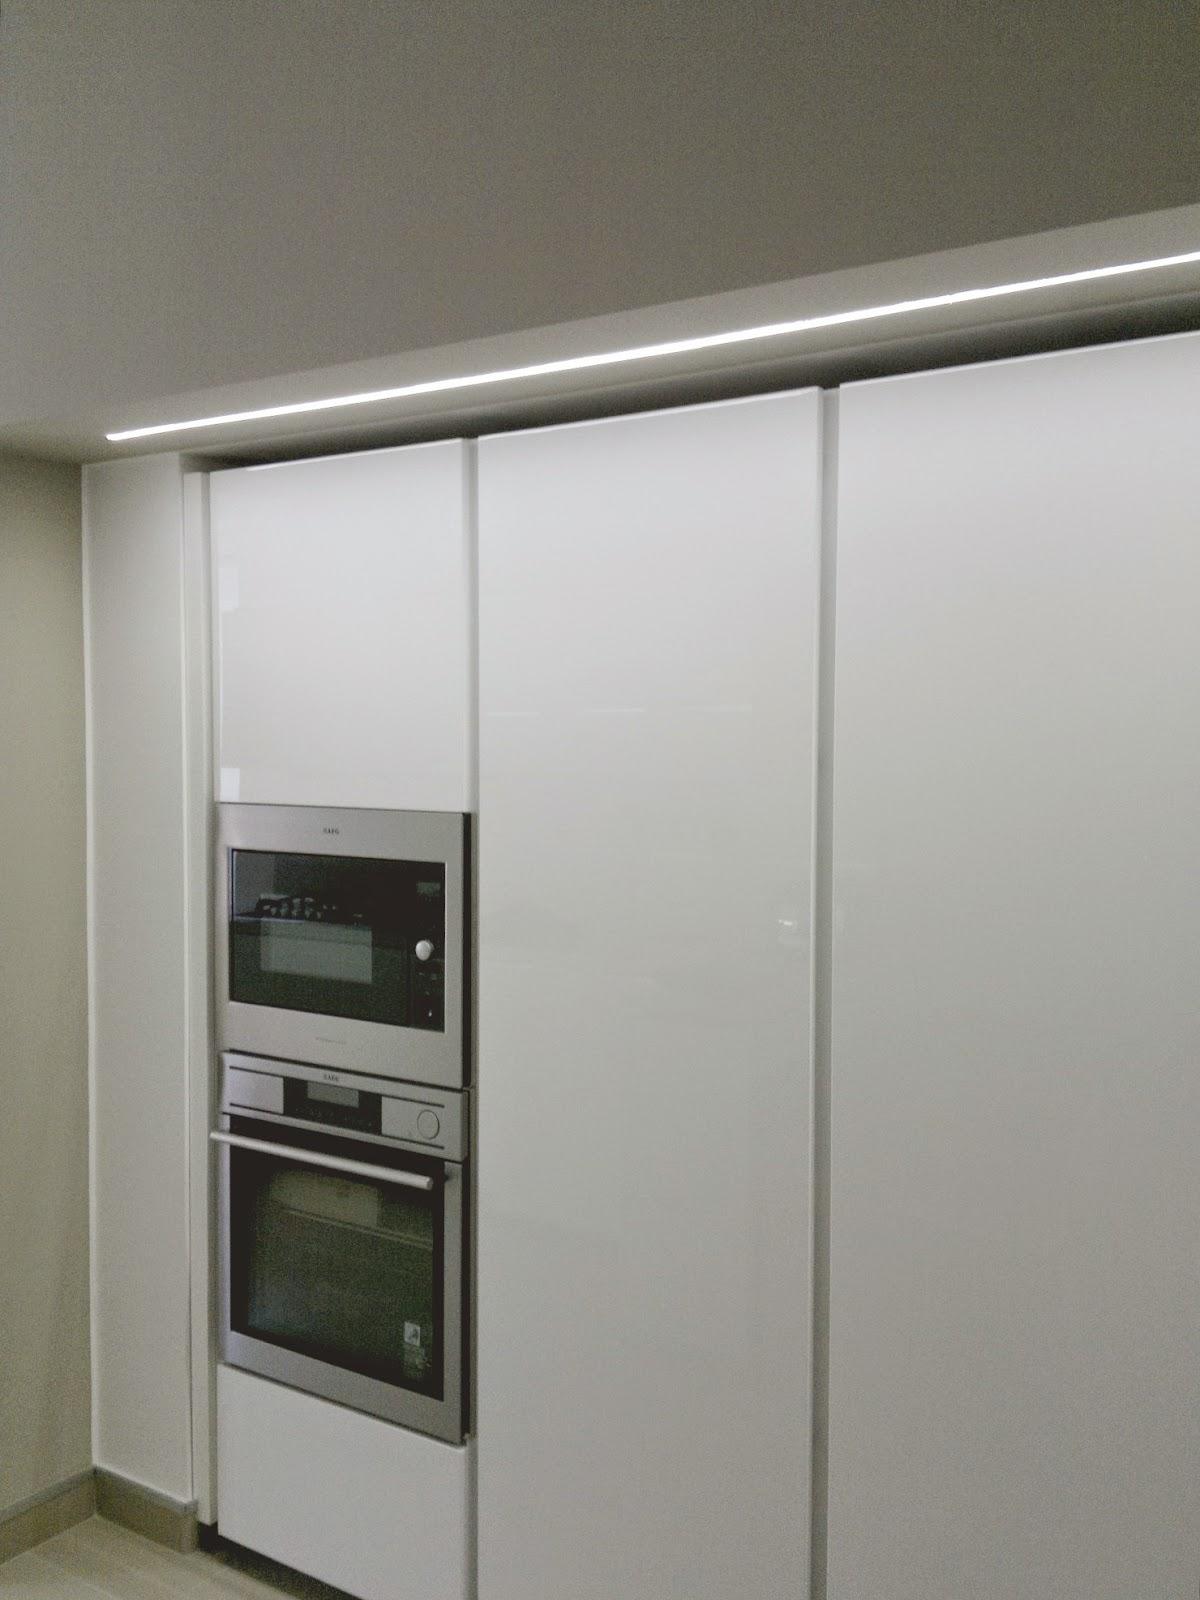 illuminazione-led-casa-cucina-strip-led-incasso-soffitto.jpg